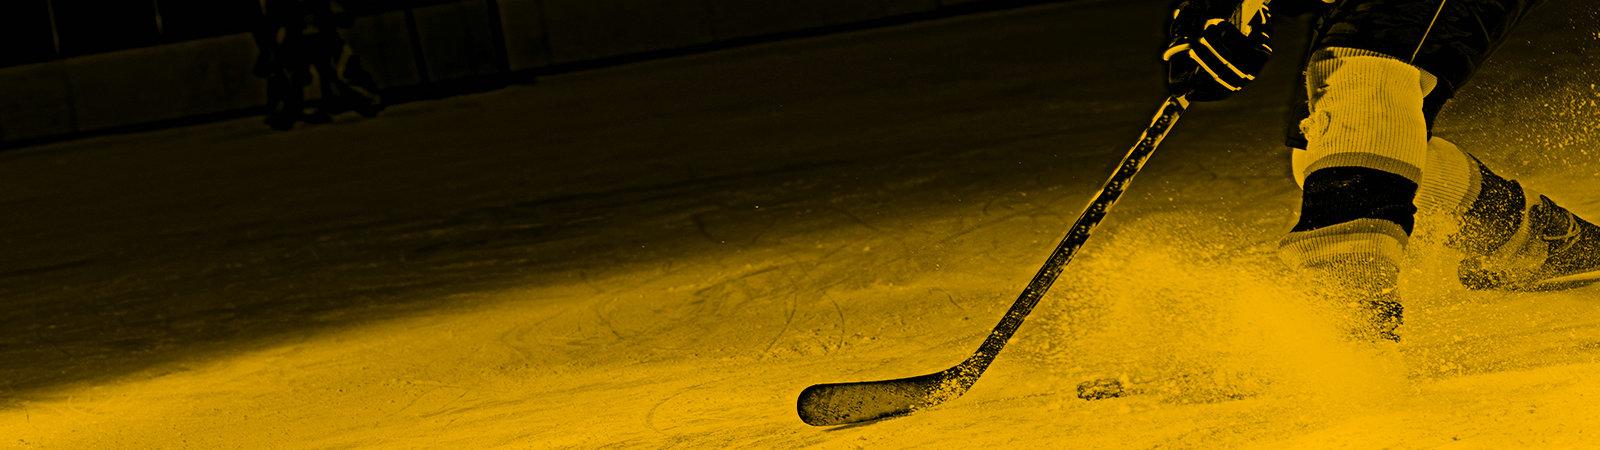 2018 NHL Stanley cup jerseys online